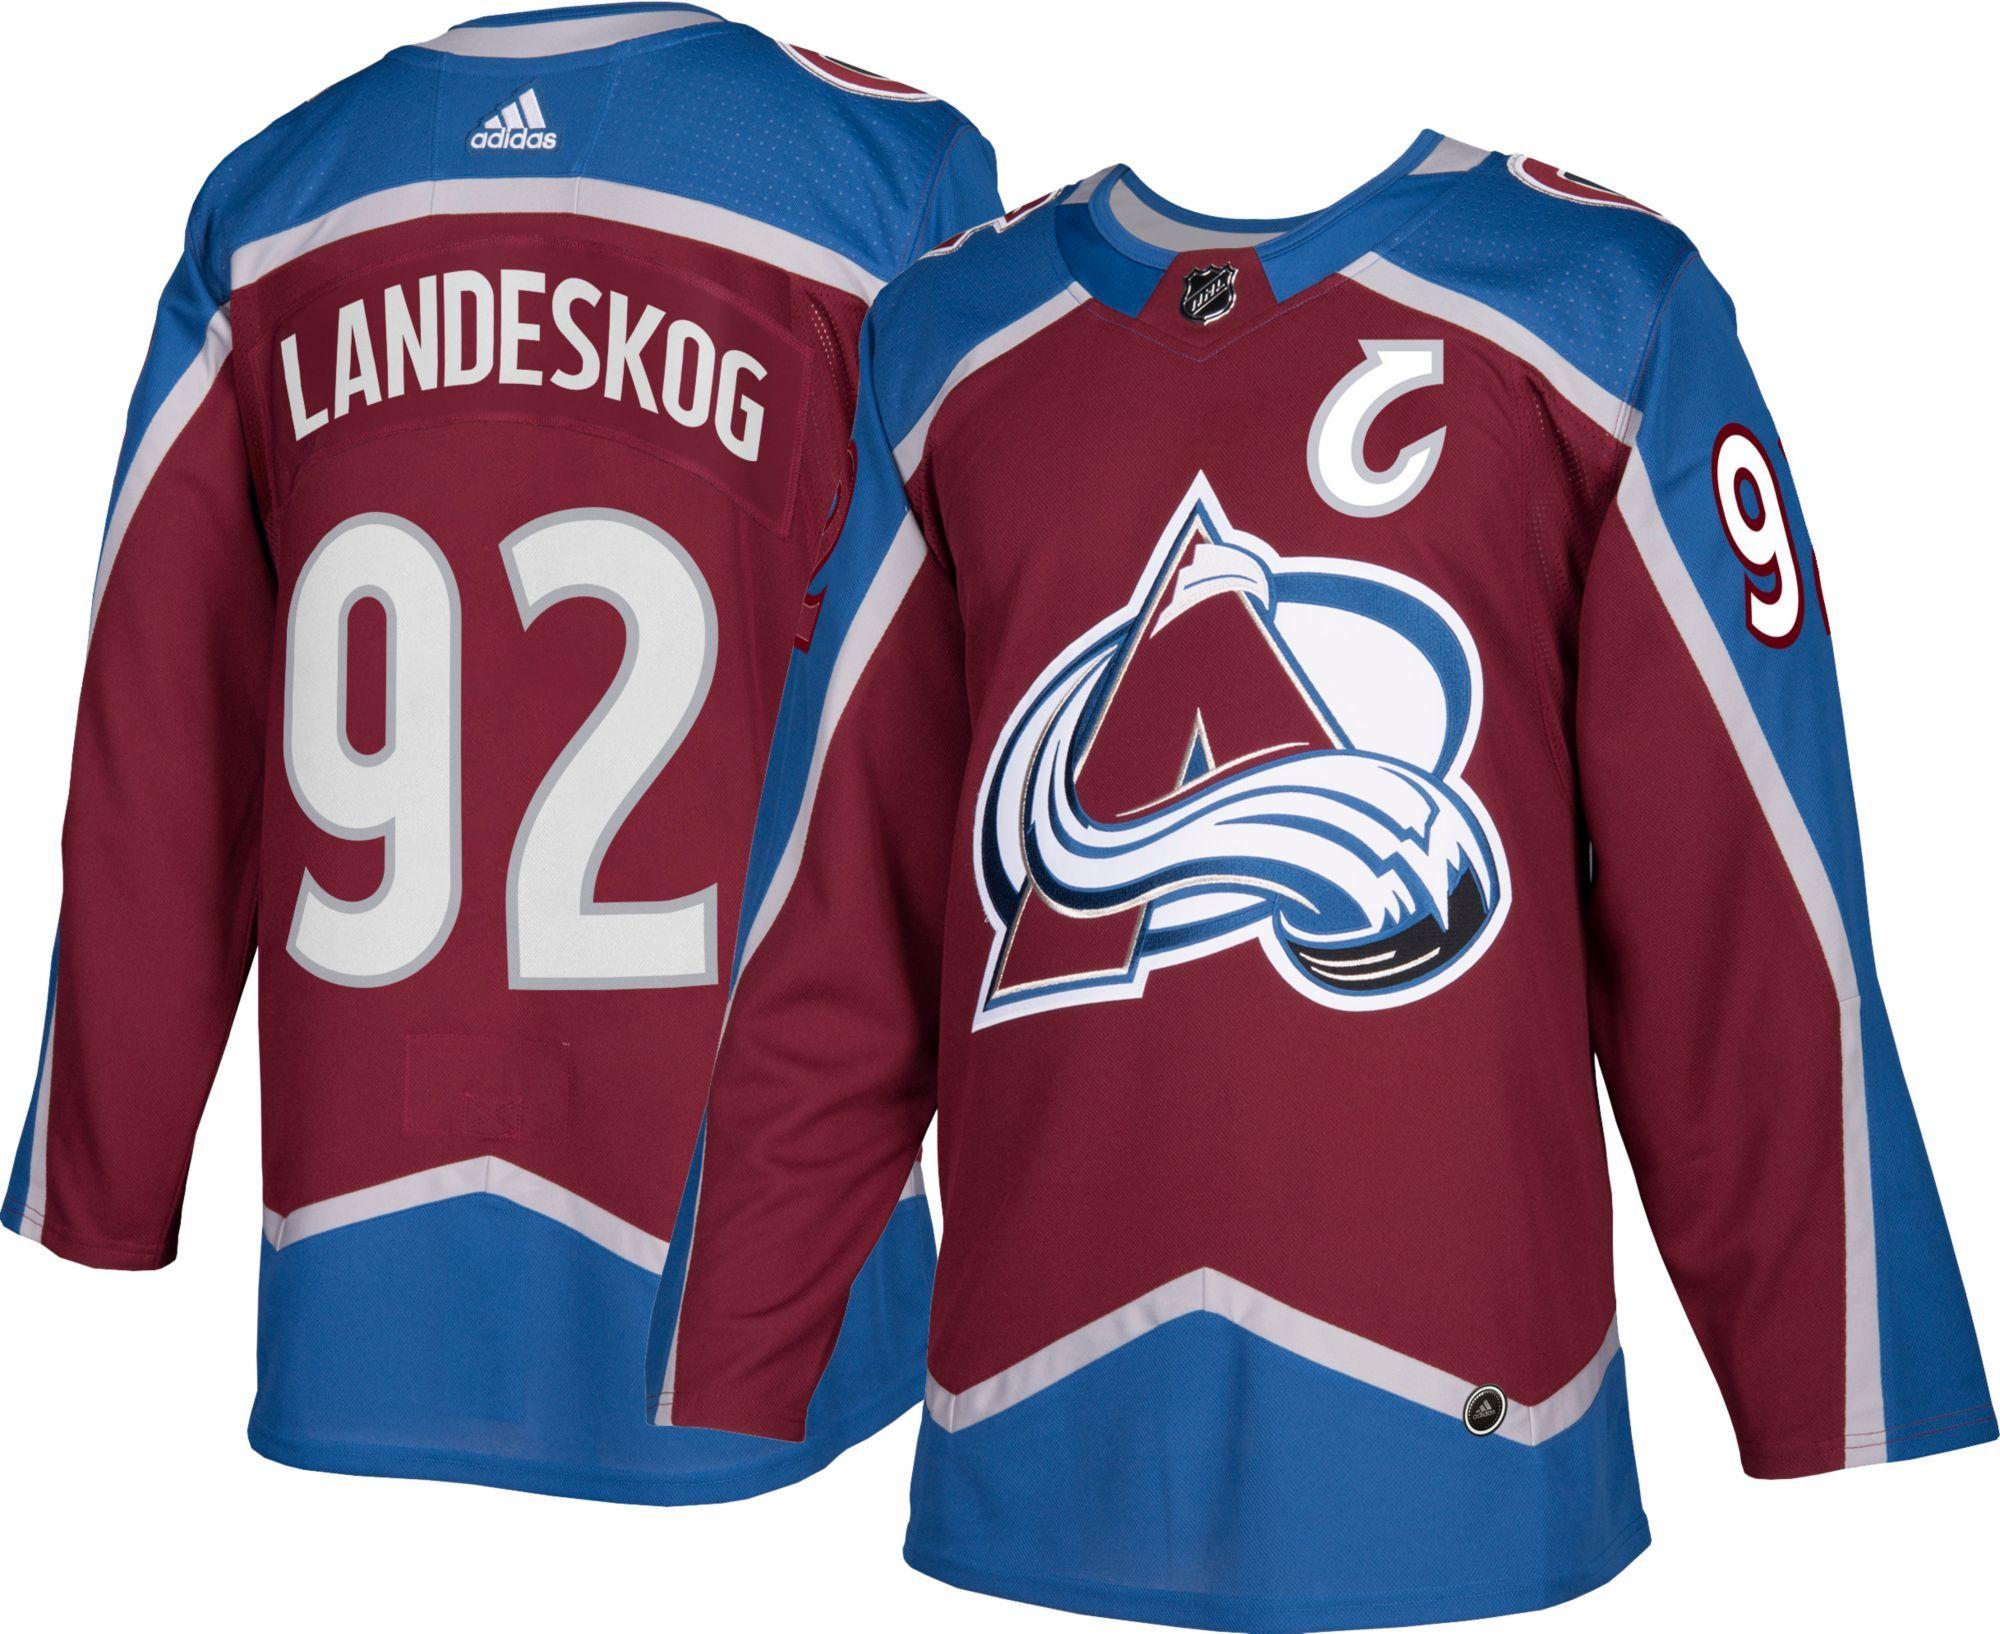 c238572f24a adidas Men s Colorado Avalanche Gabriel Landeskog  92 Authentic Pro Home  Jersey